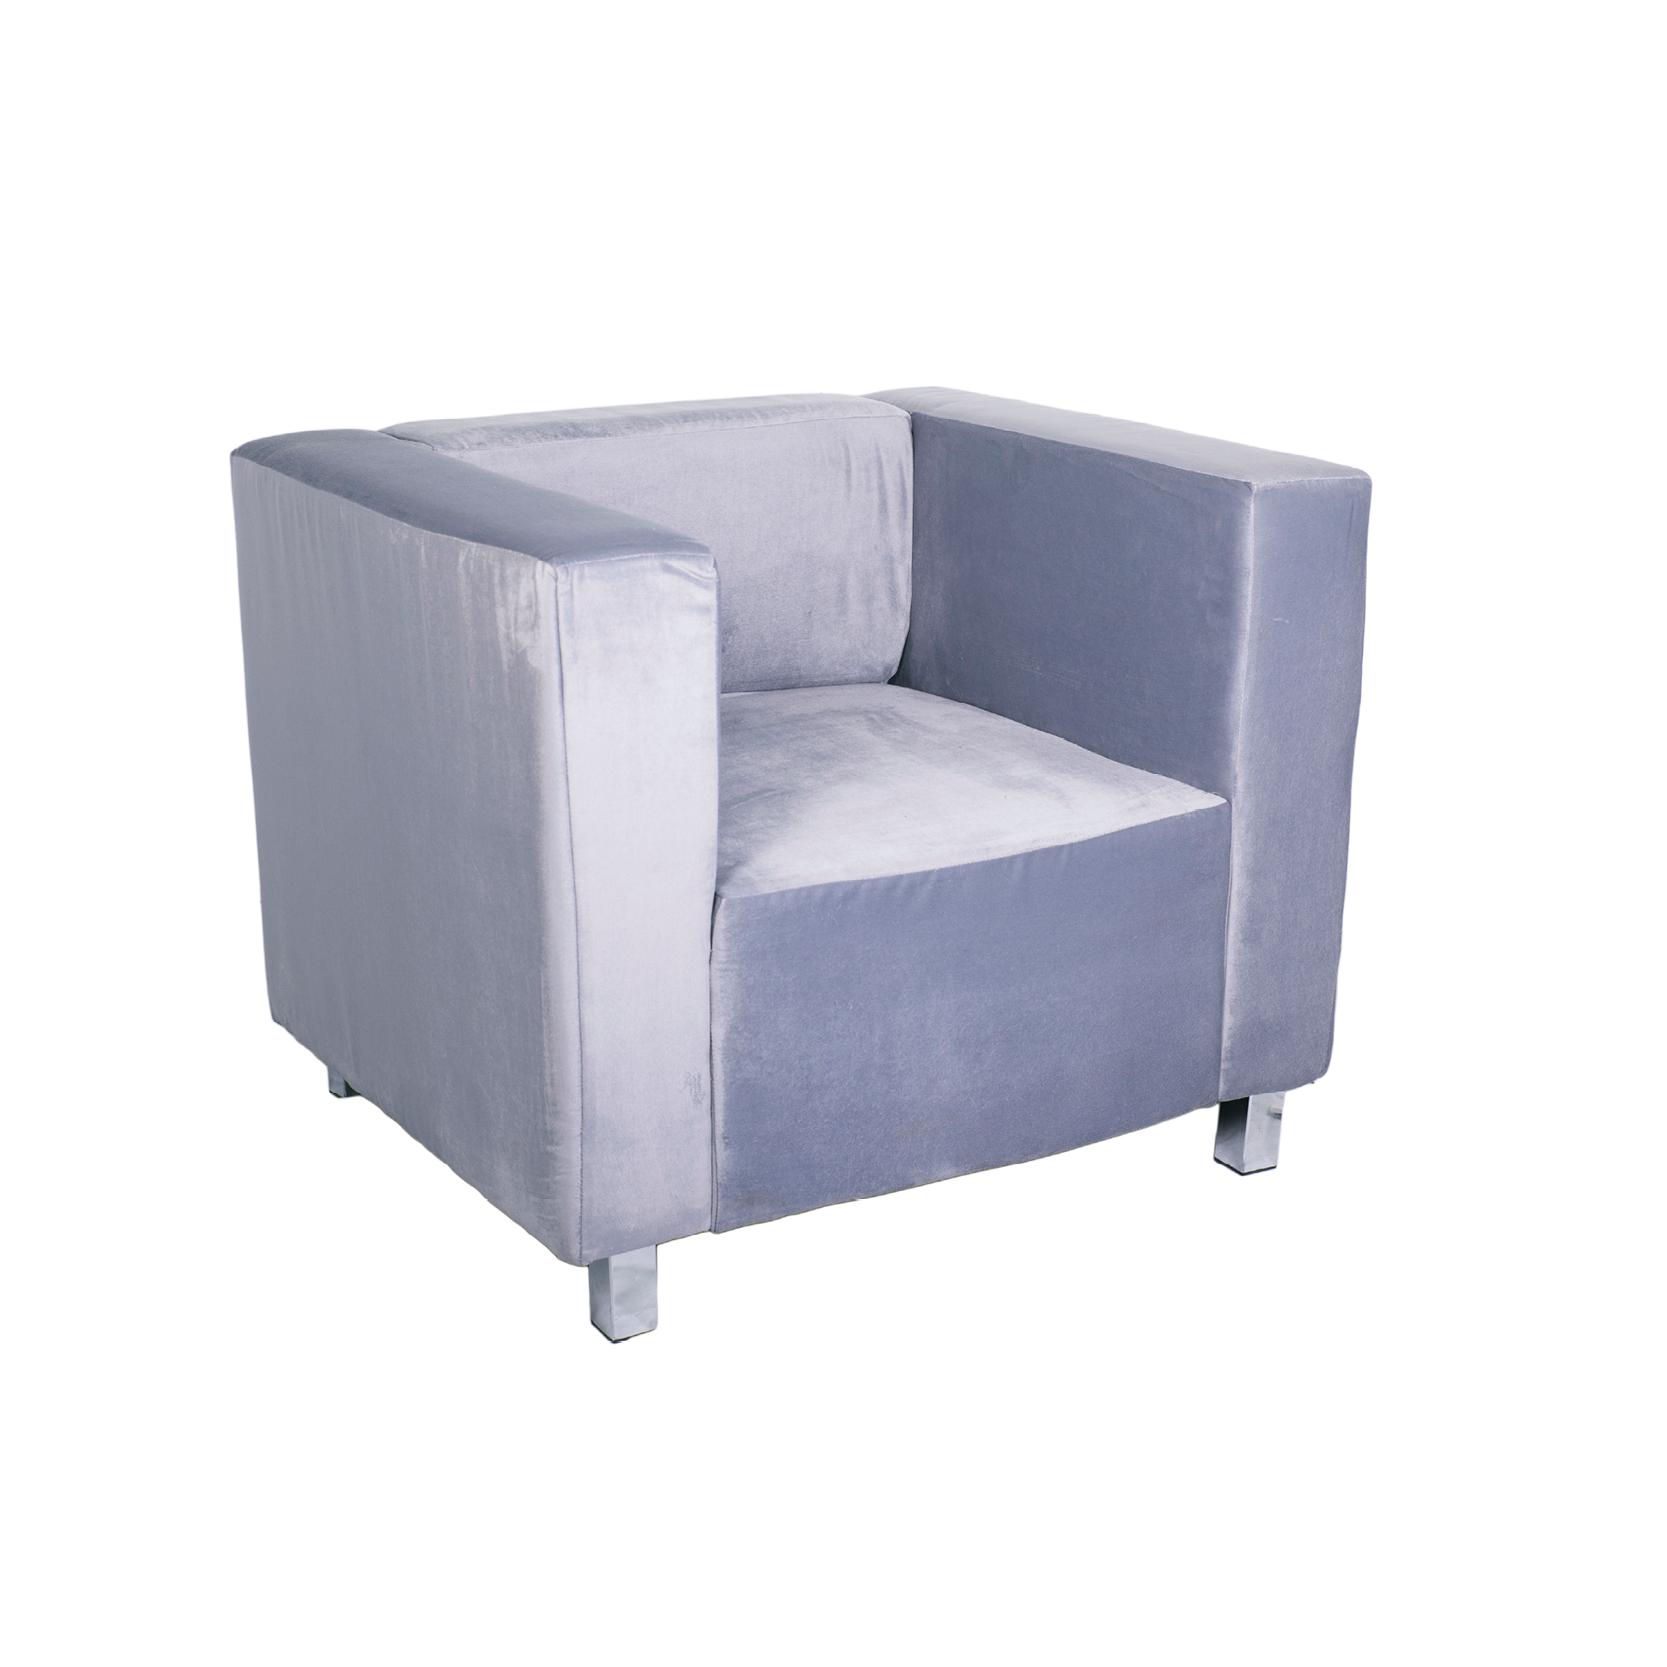 Kubus Fabric Armchair Grey - Thorns Group